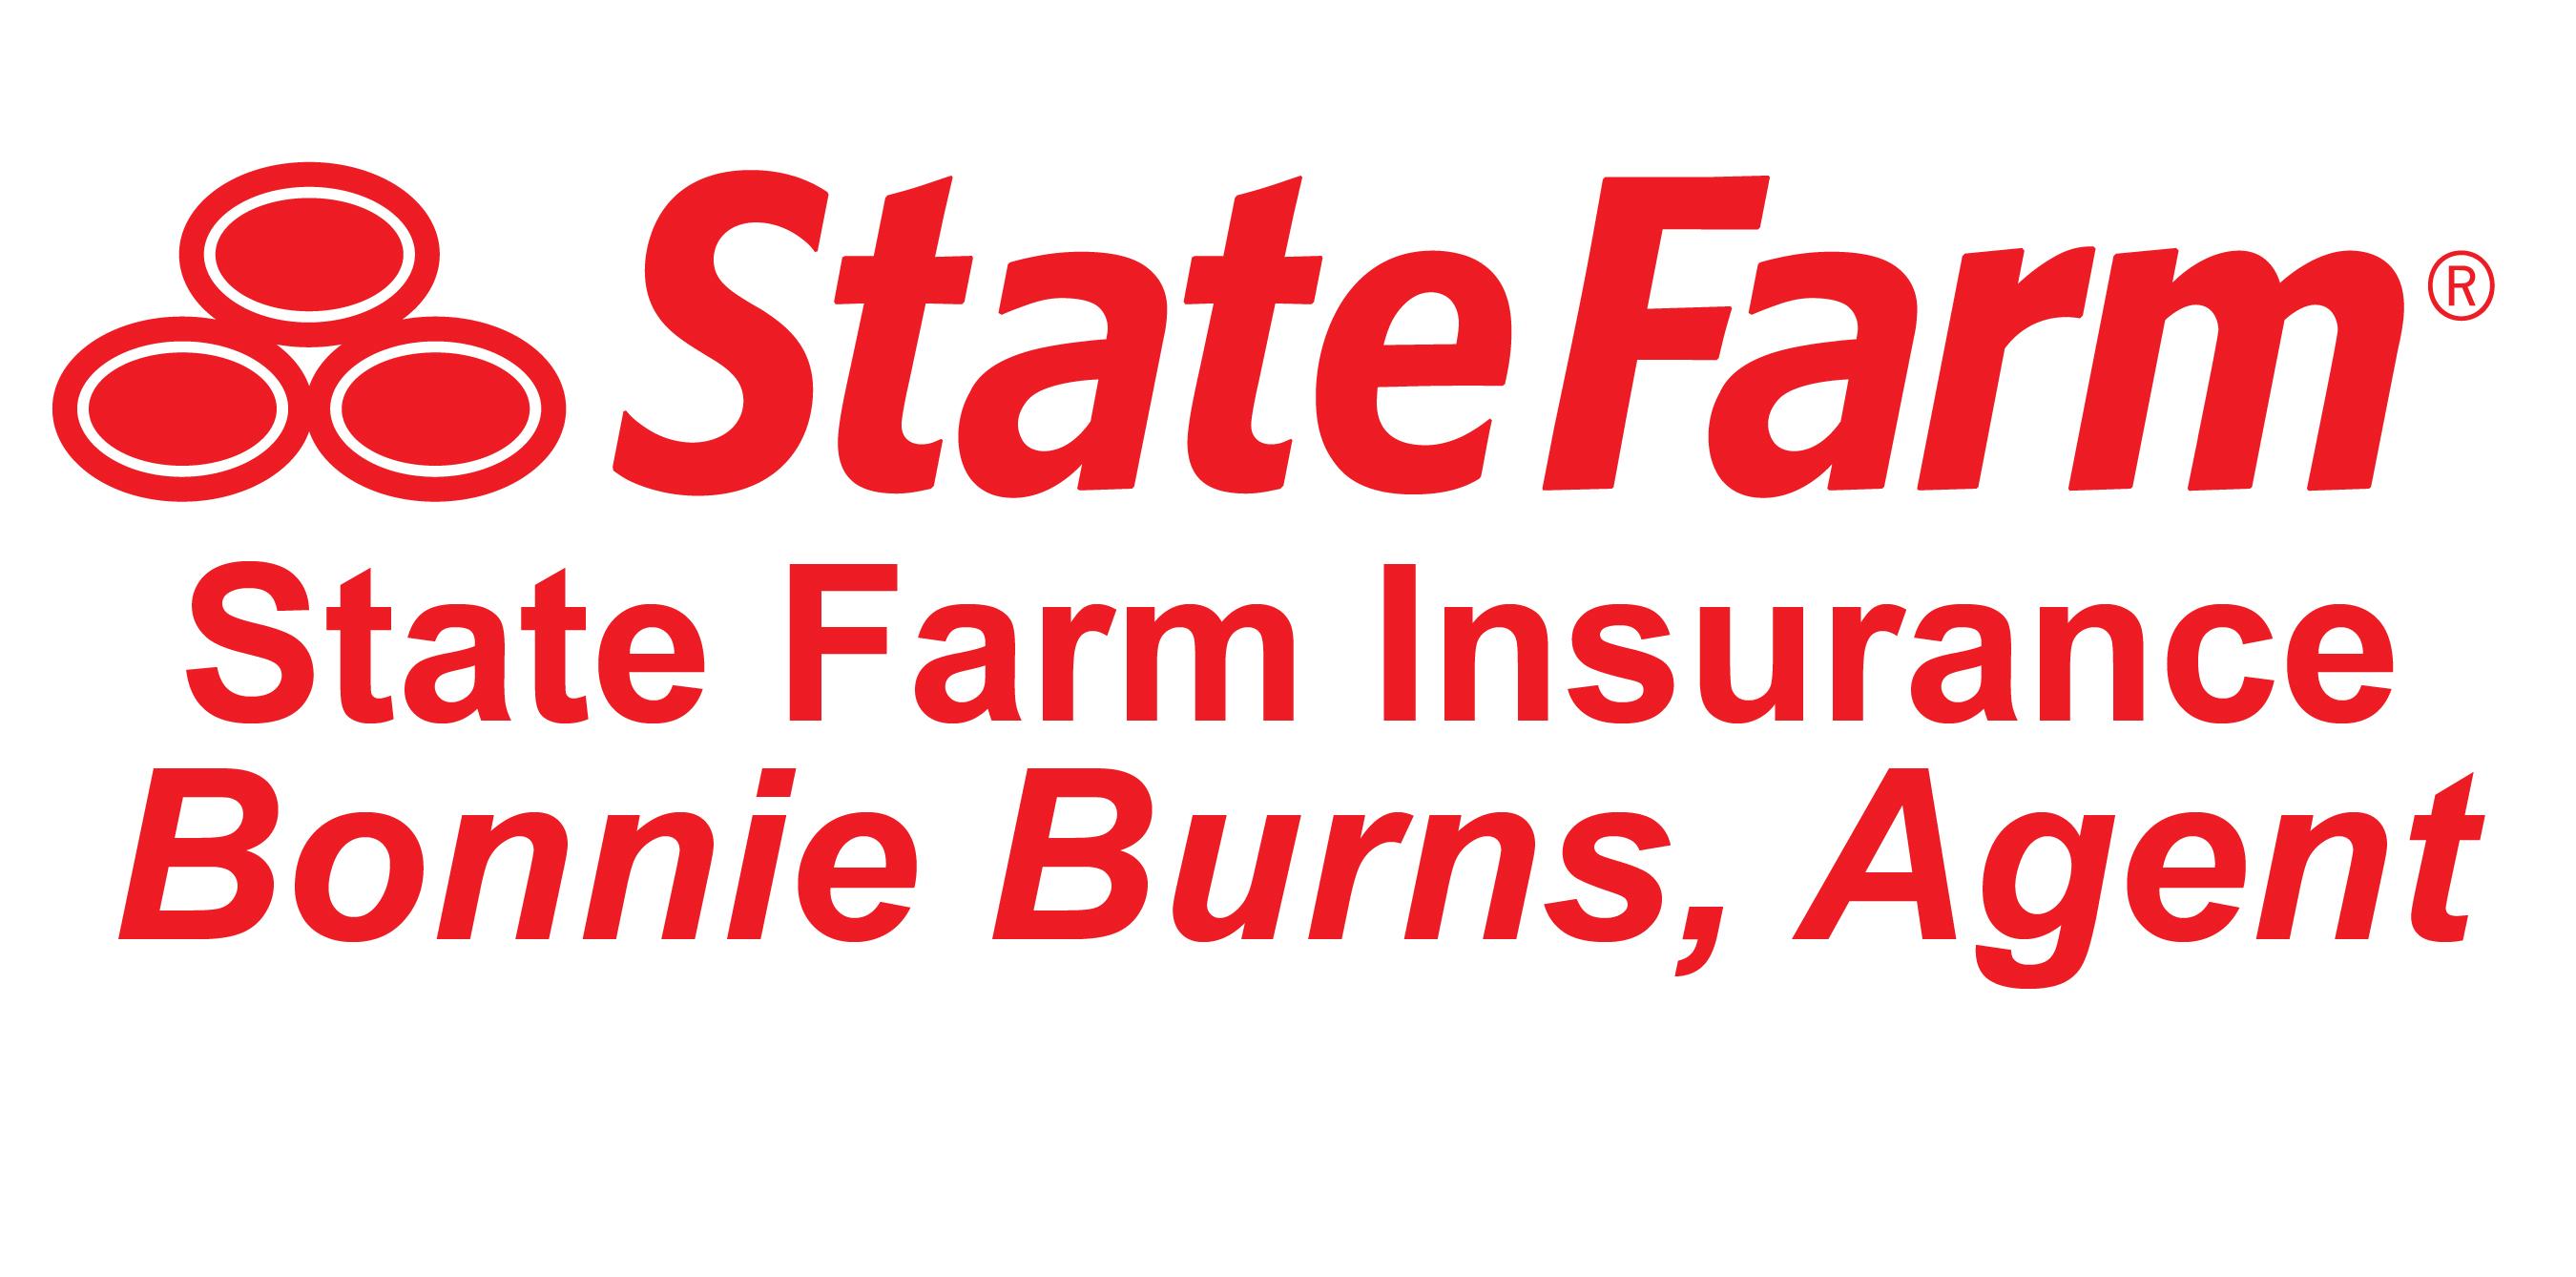 Sponsor State Farm Insurance - Bonnie Burns, Agent